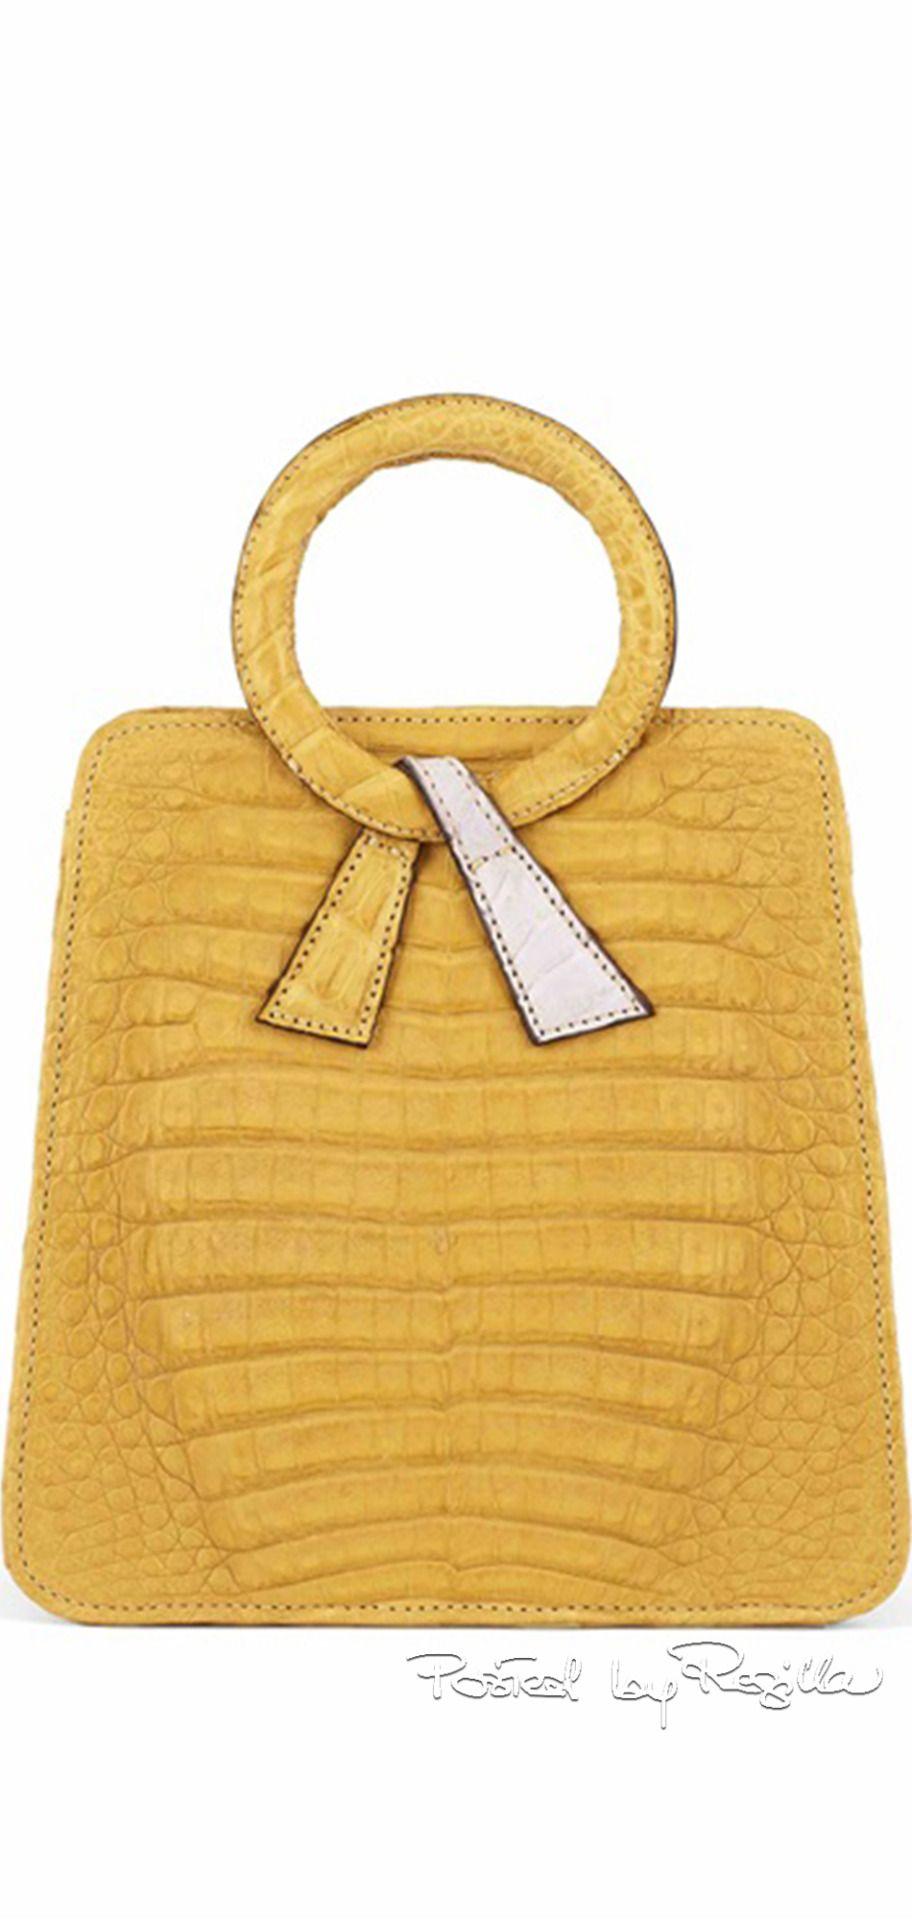 Regilla gilbert halaby leather love pinterest bag purse